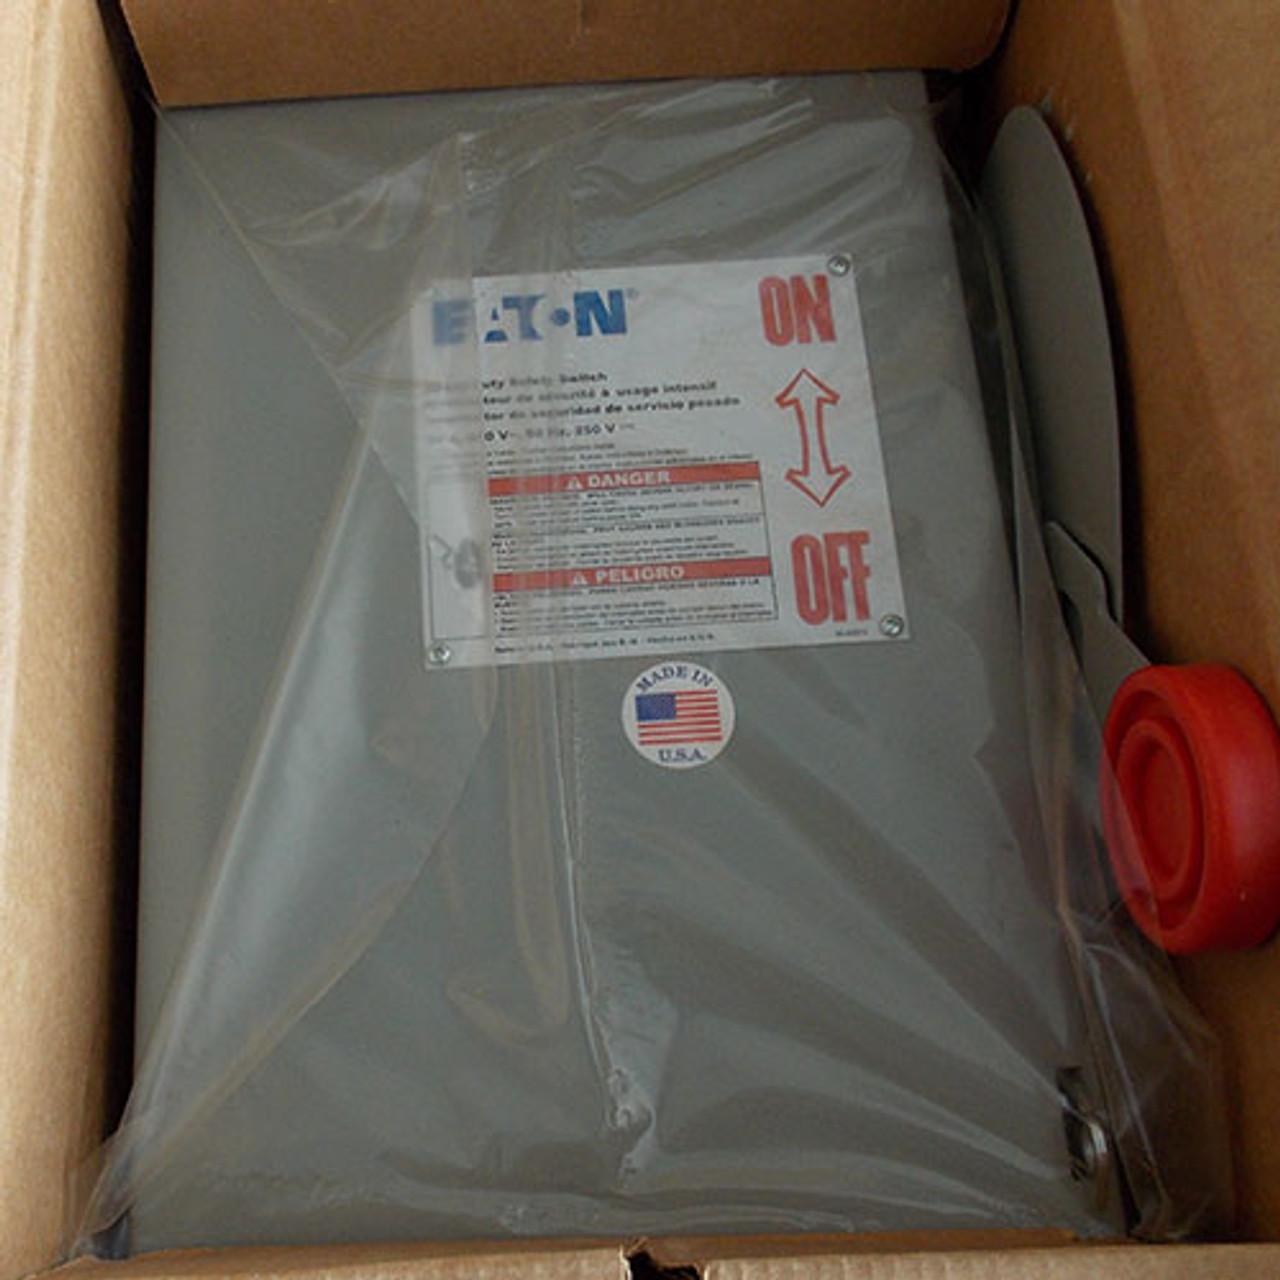 Eaton DH221FRK Heavy Duty Fusible Safety Switch 2 Pole 30 Amp 240V Nema 3R - New